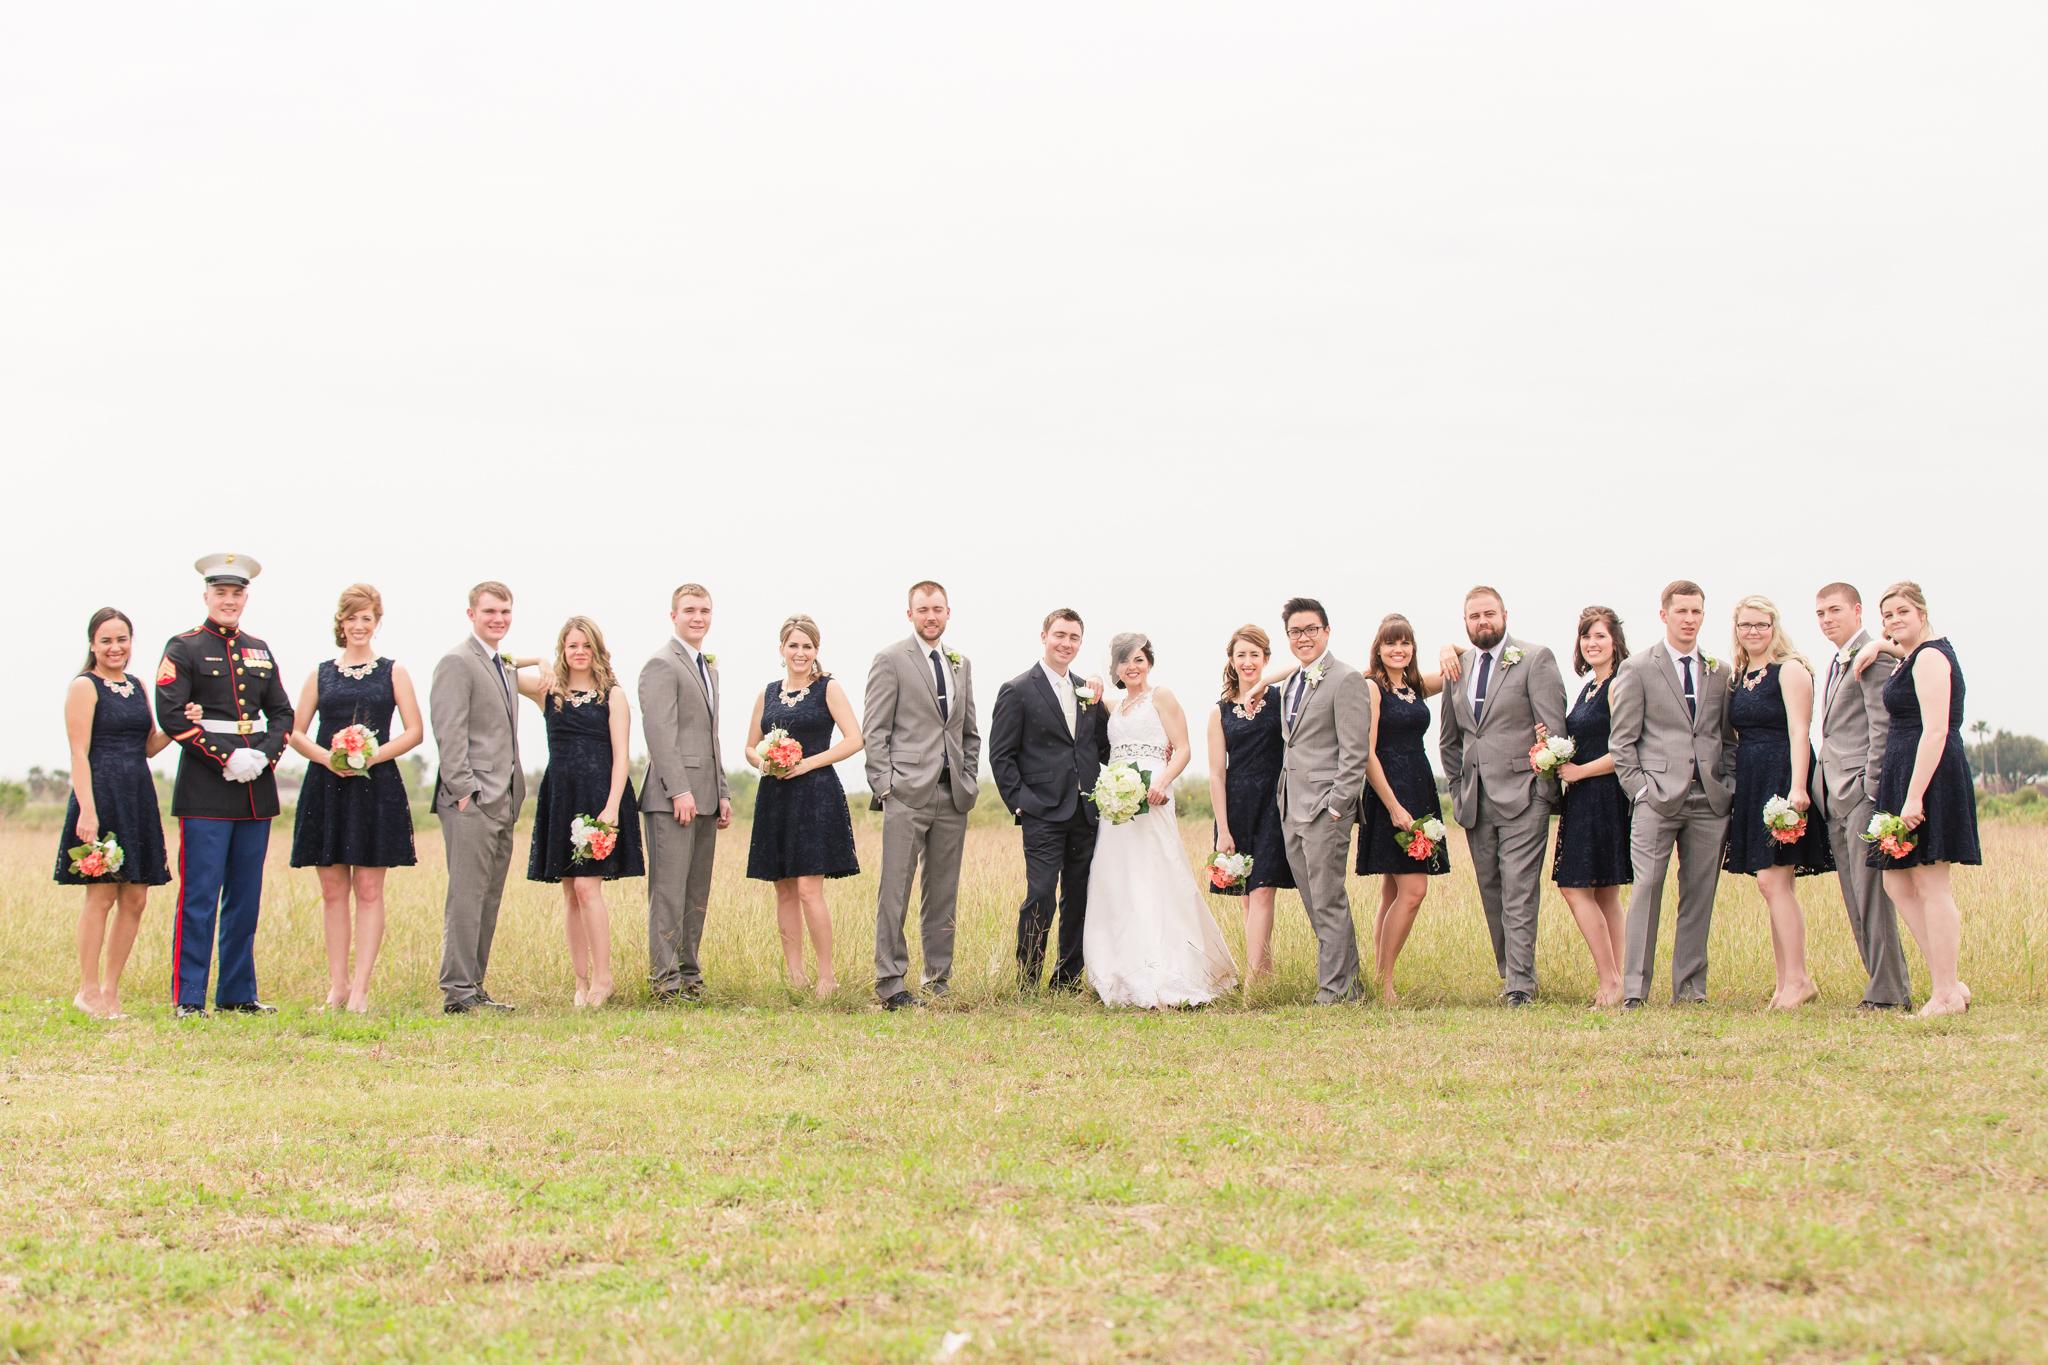 Ashley-Amber-Photo-Outdoor-Wedding-Photography-125931.jpg